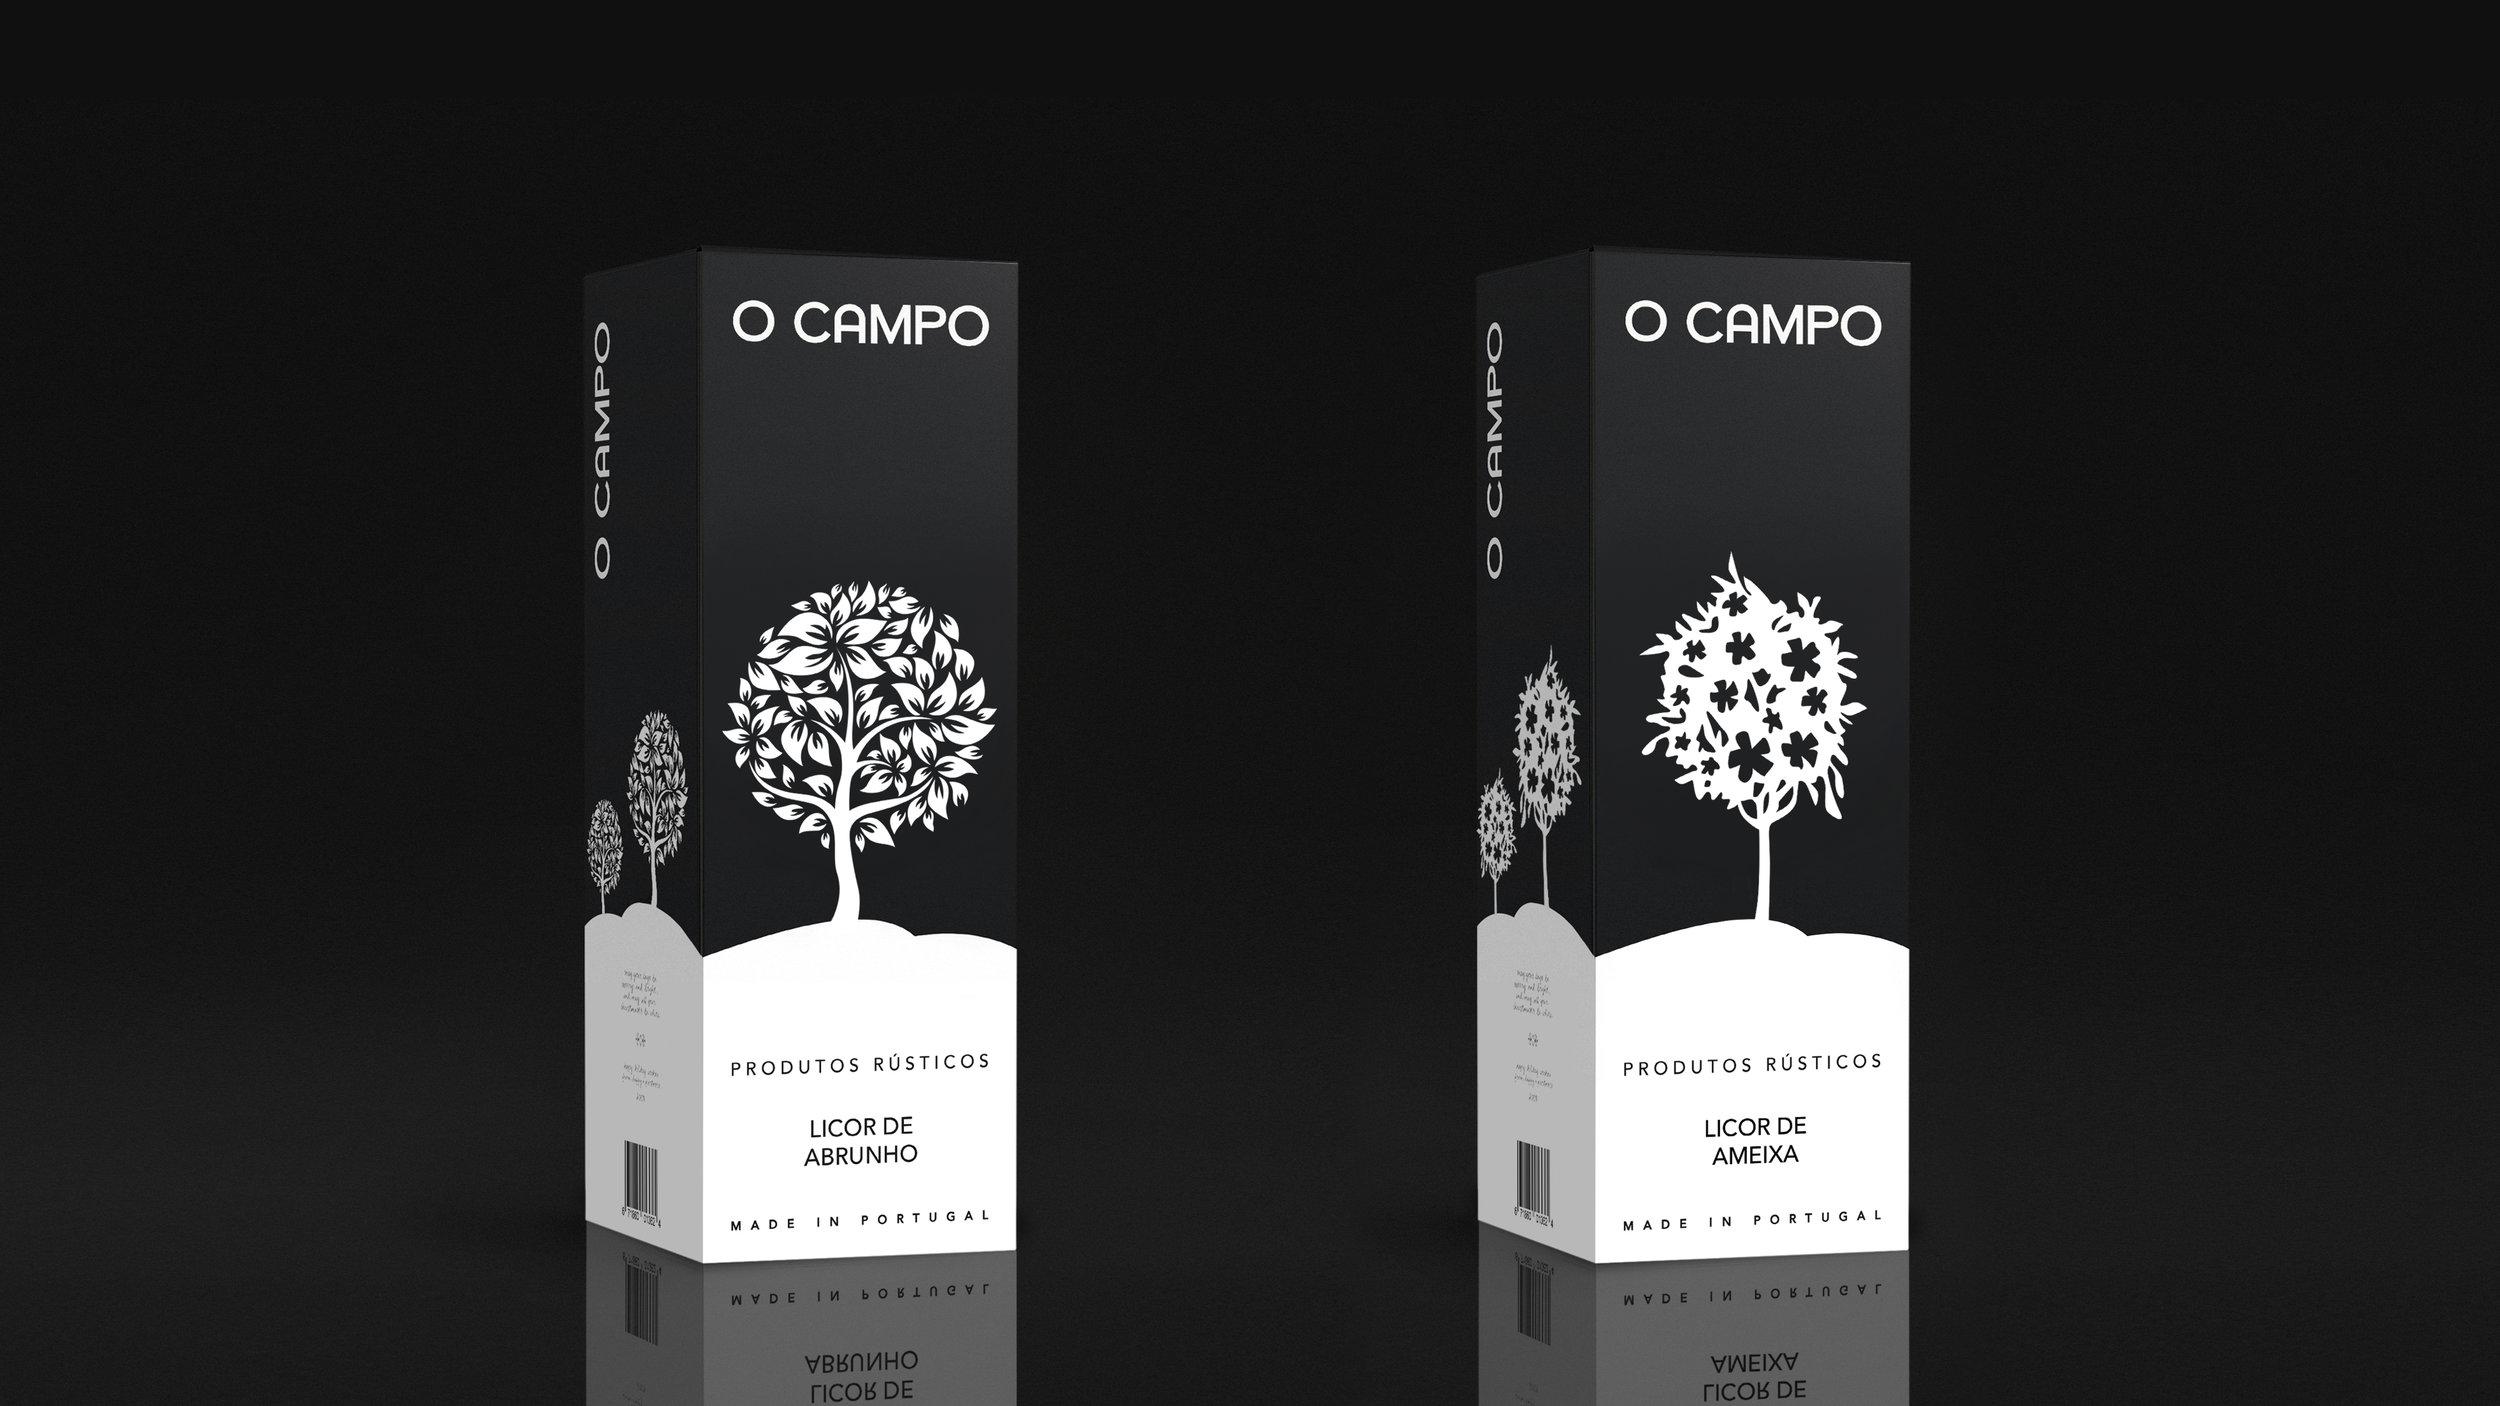 Brand_republica_ocampo_liqueur_boxes_packaging_design.jpg